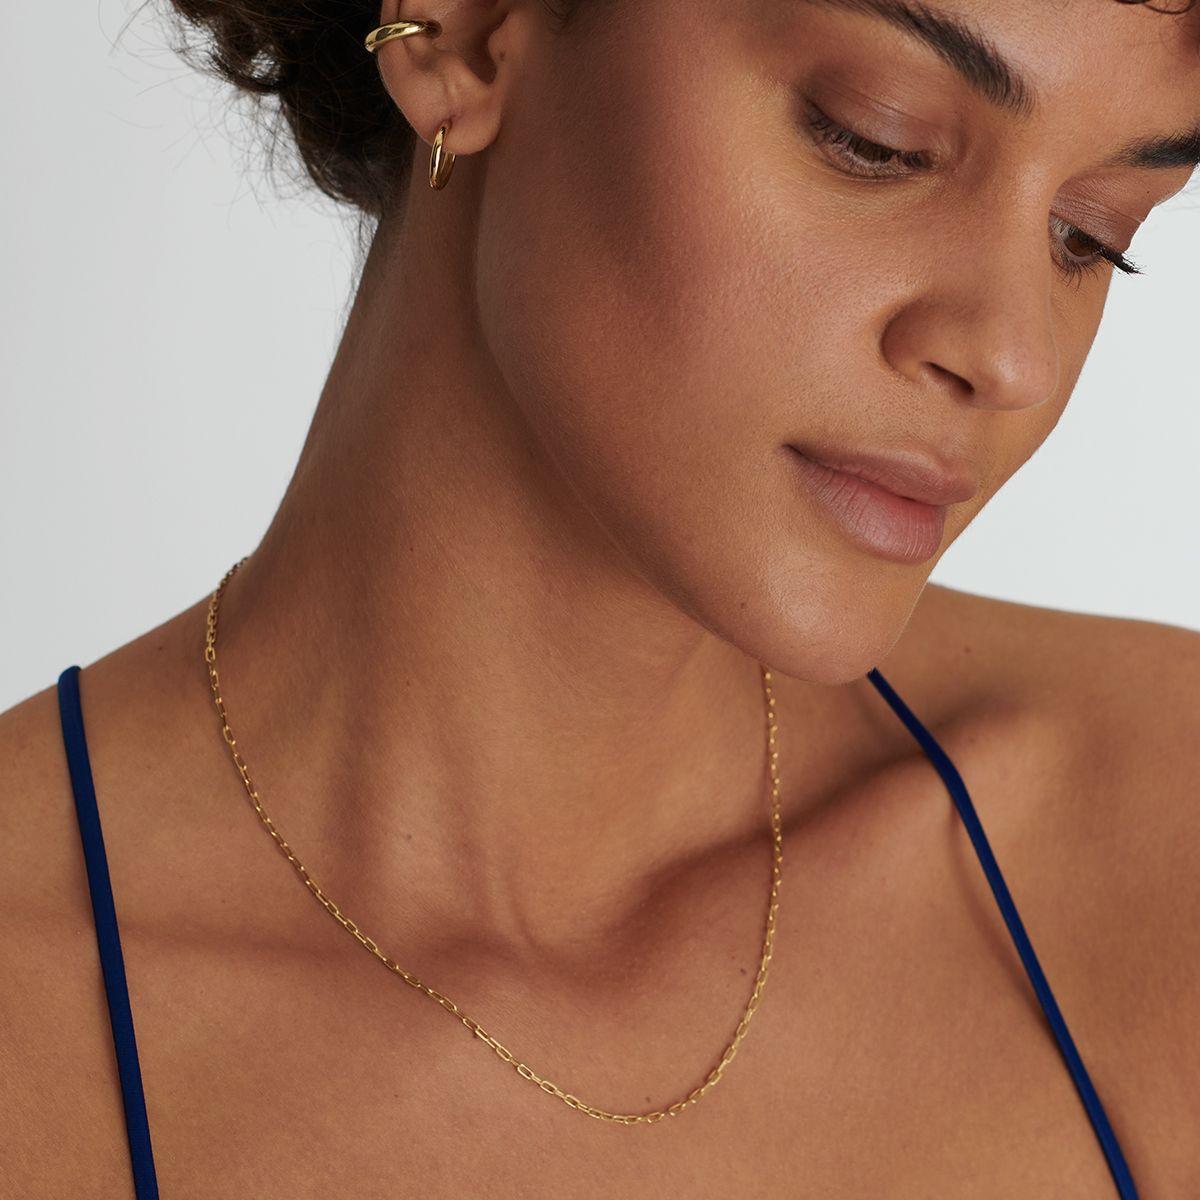 Felicitas - Halsketten - 18k vergoldet